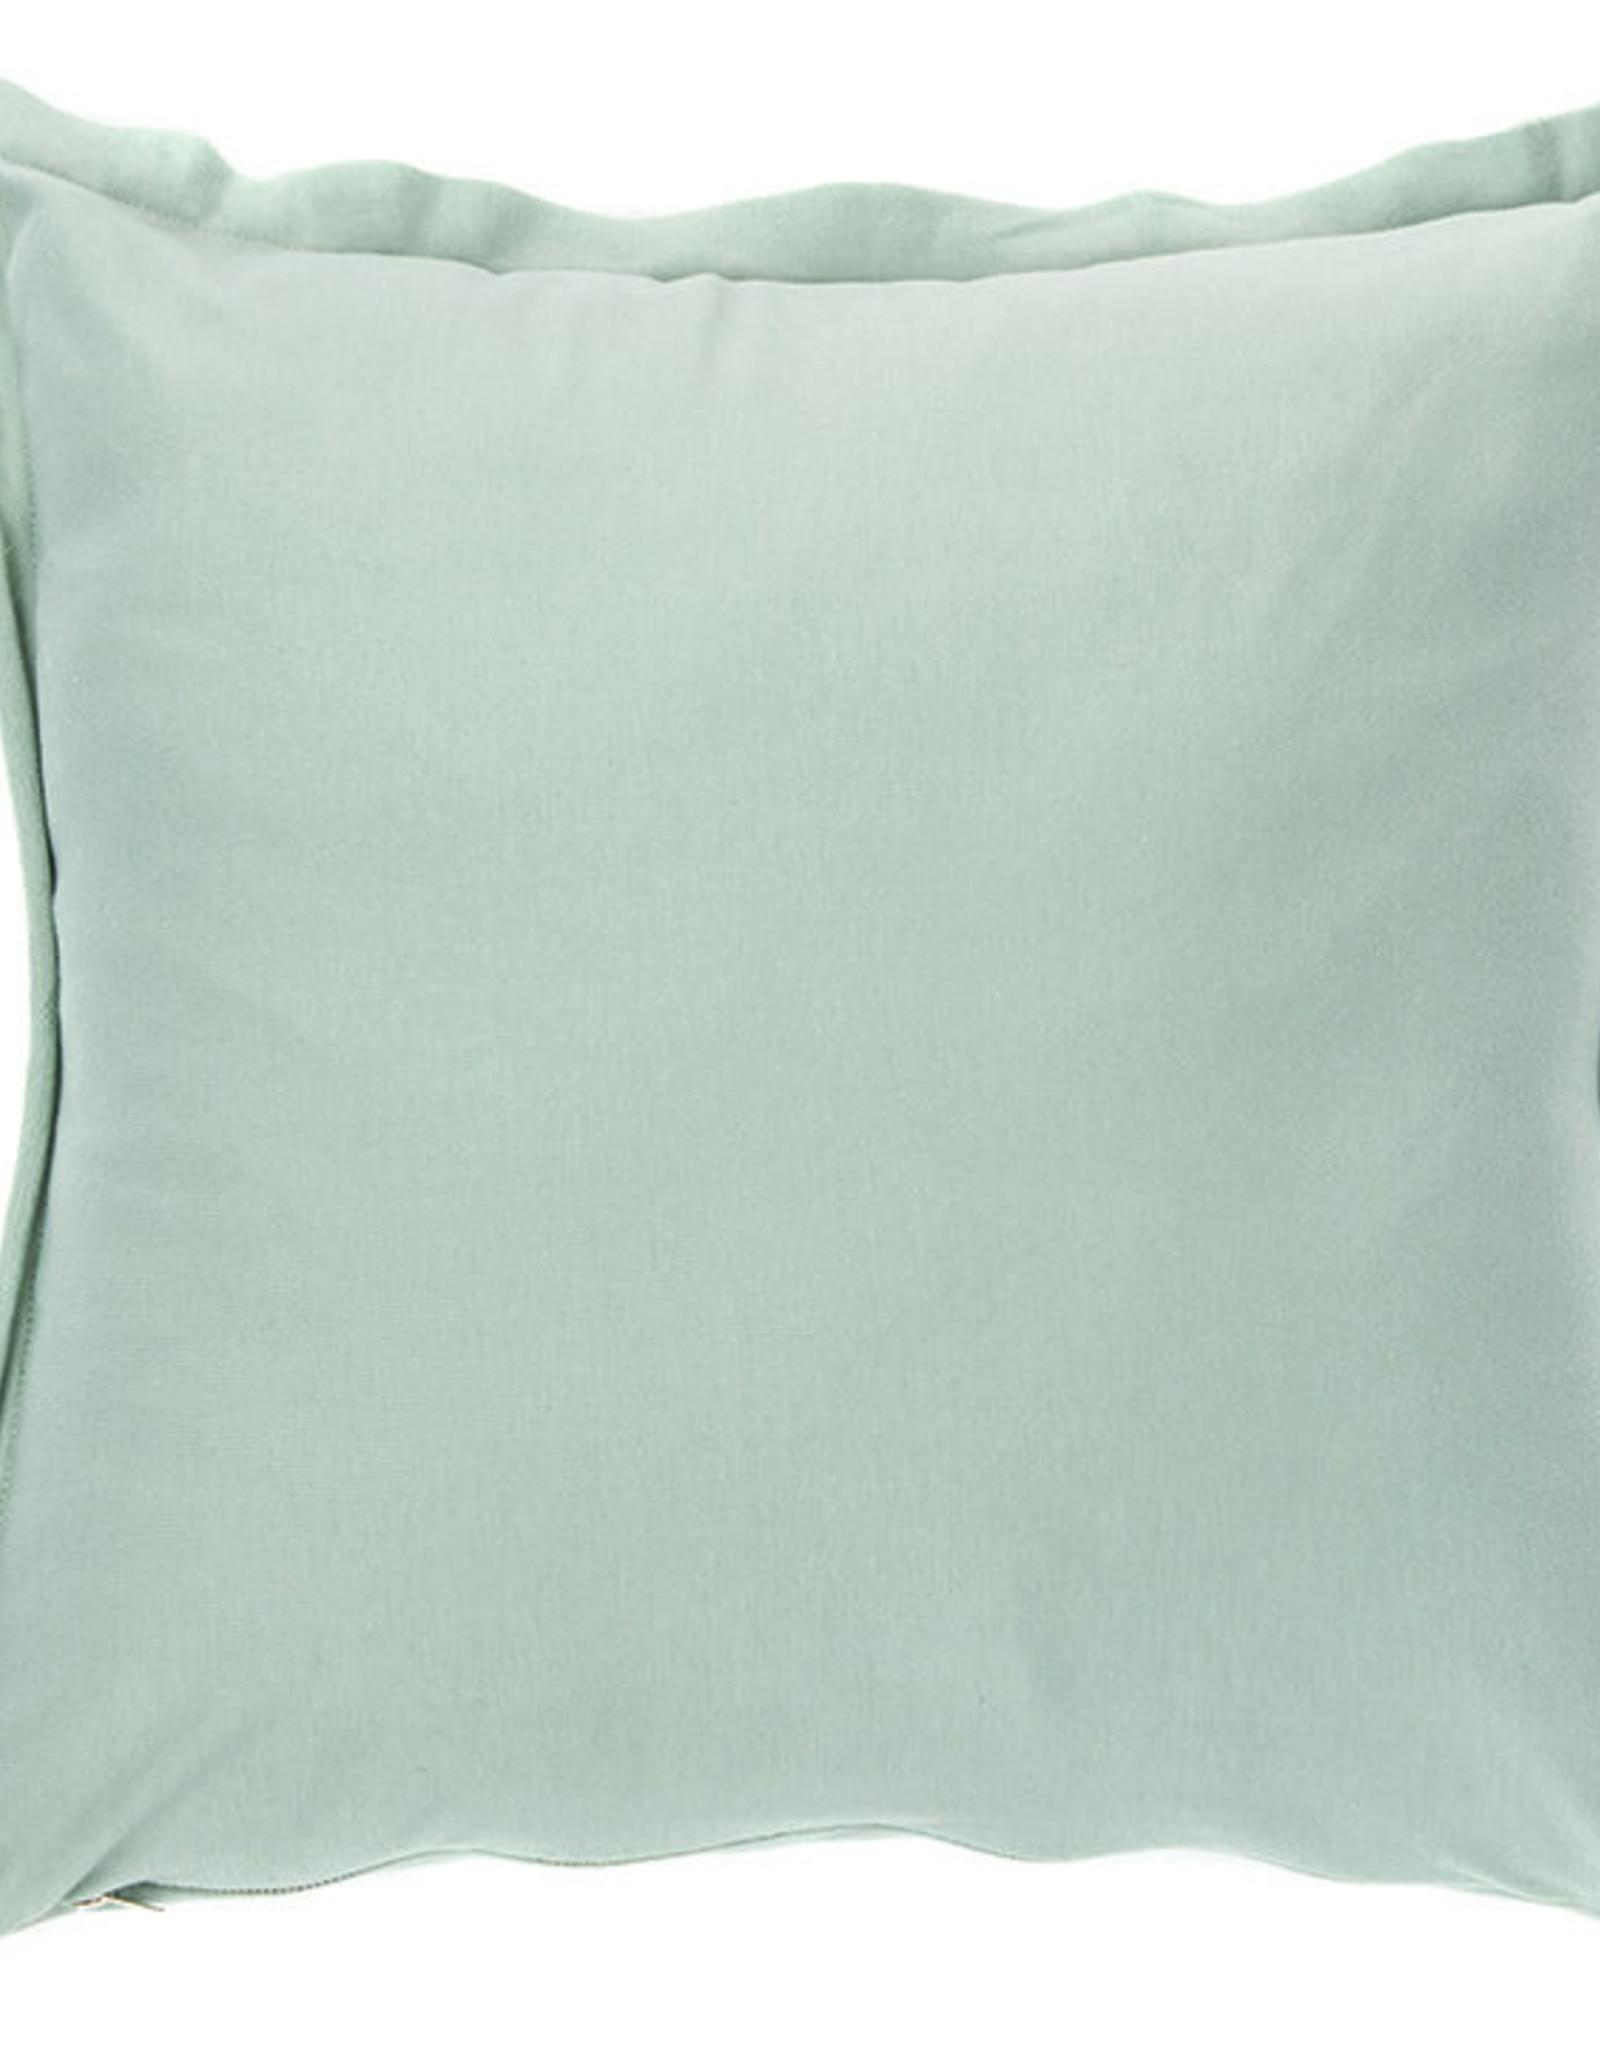 Cushions Brunelli Hoodie Sage 18 x 18